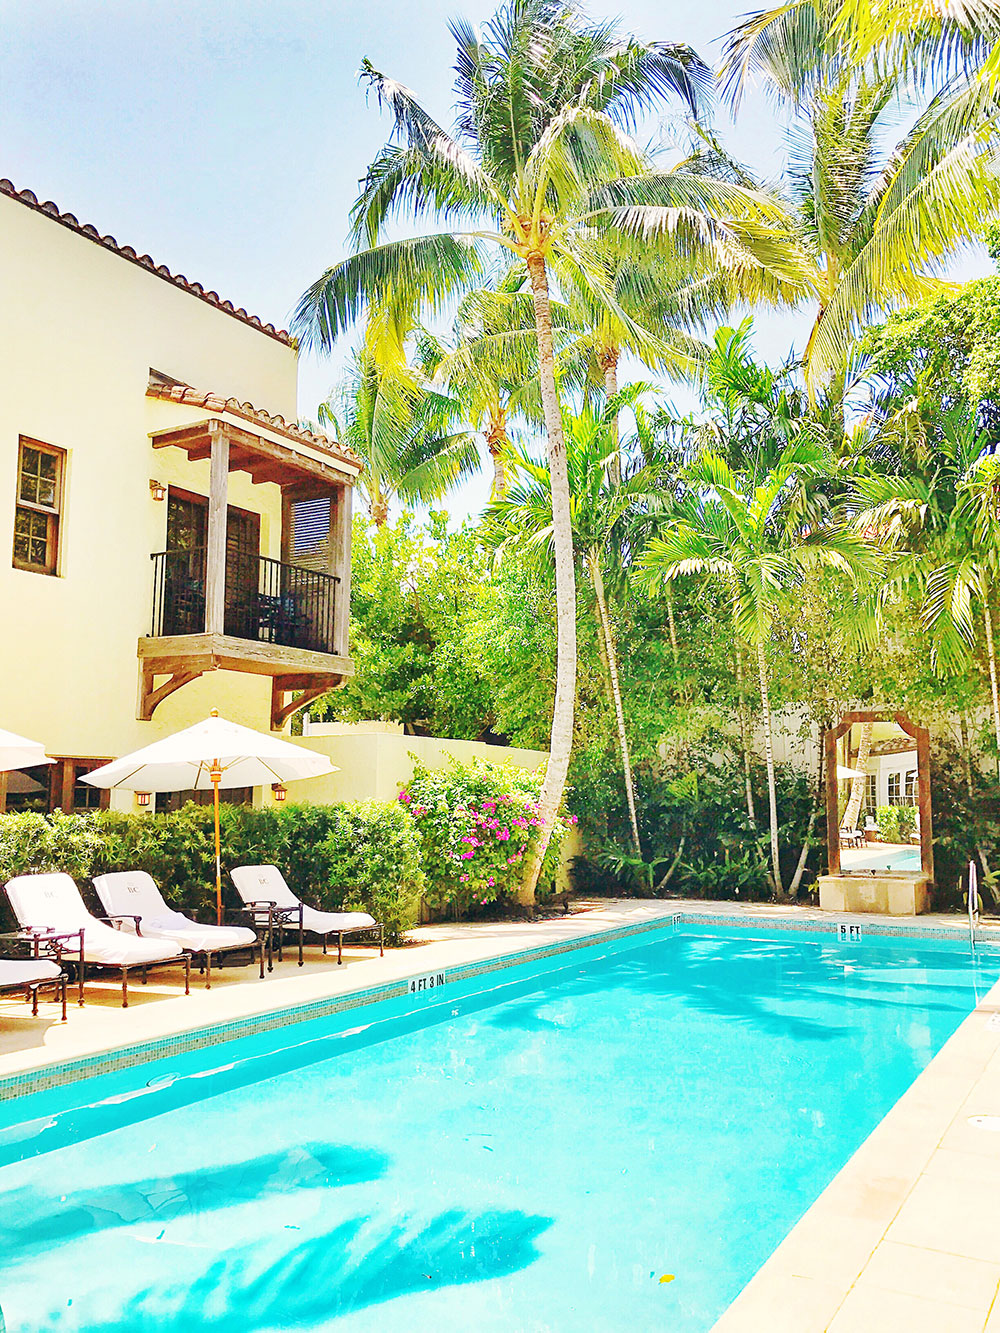 brazilian-court-hotel-palm-beach-pool